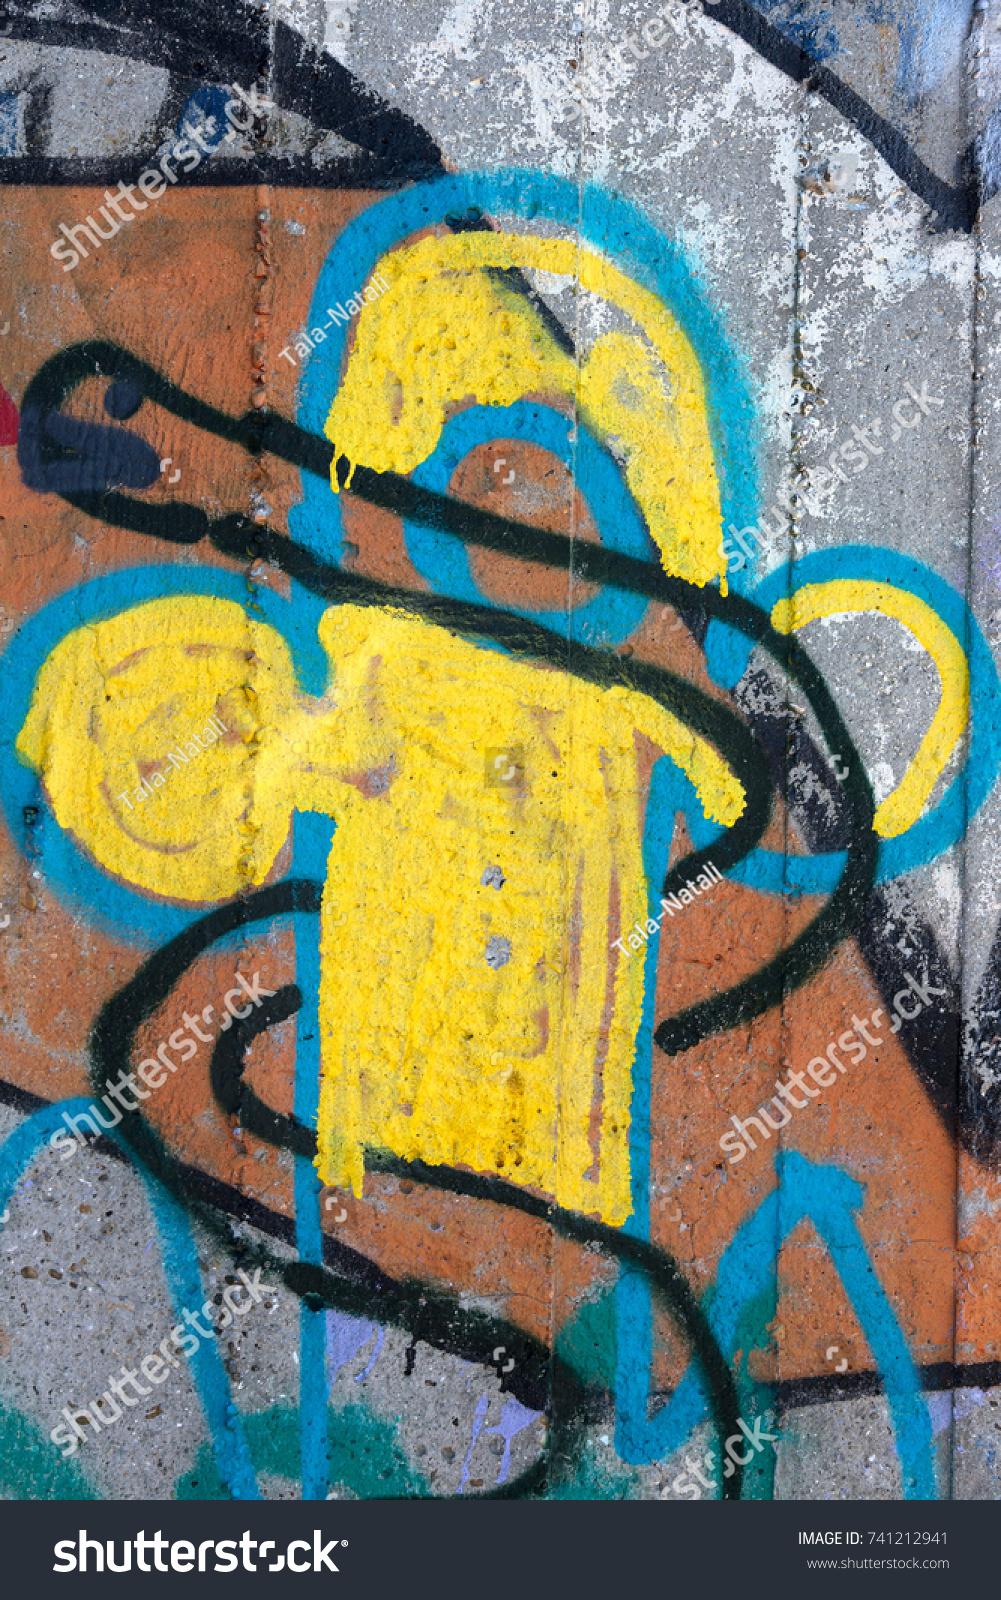 Art Under Ground Beautiful Street Art Stock Photo (Edit Now ...